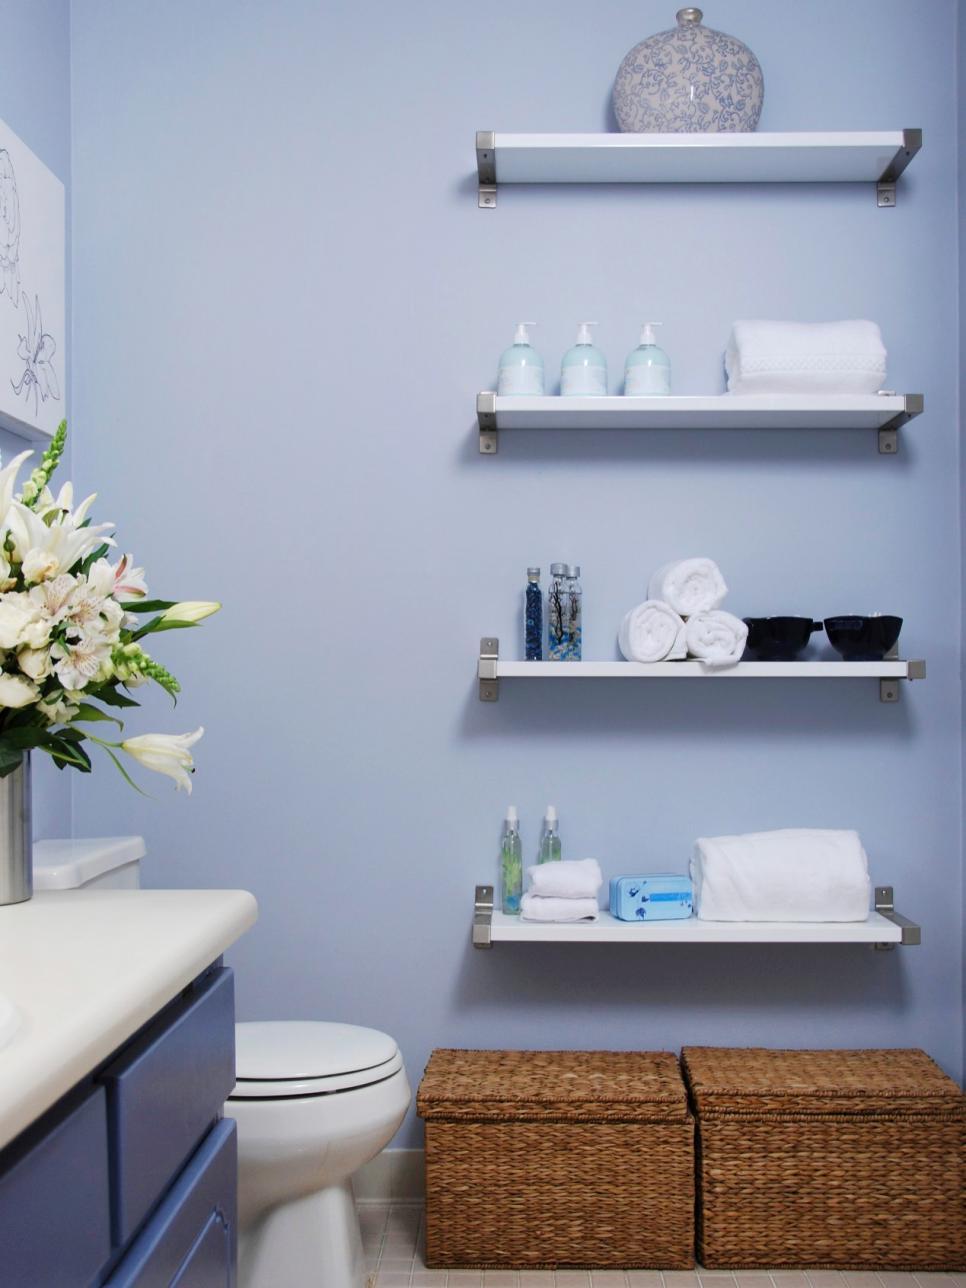 Bathroom Wall Shelves On Blue Wall Paint